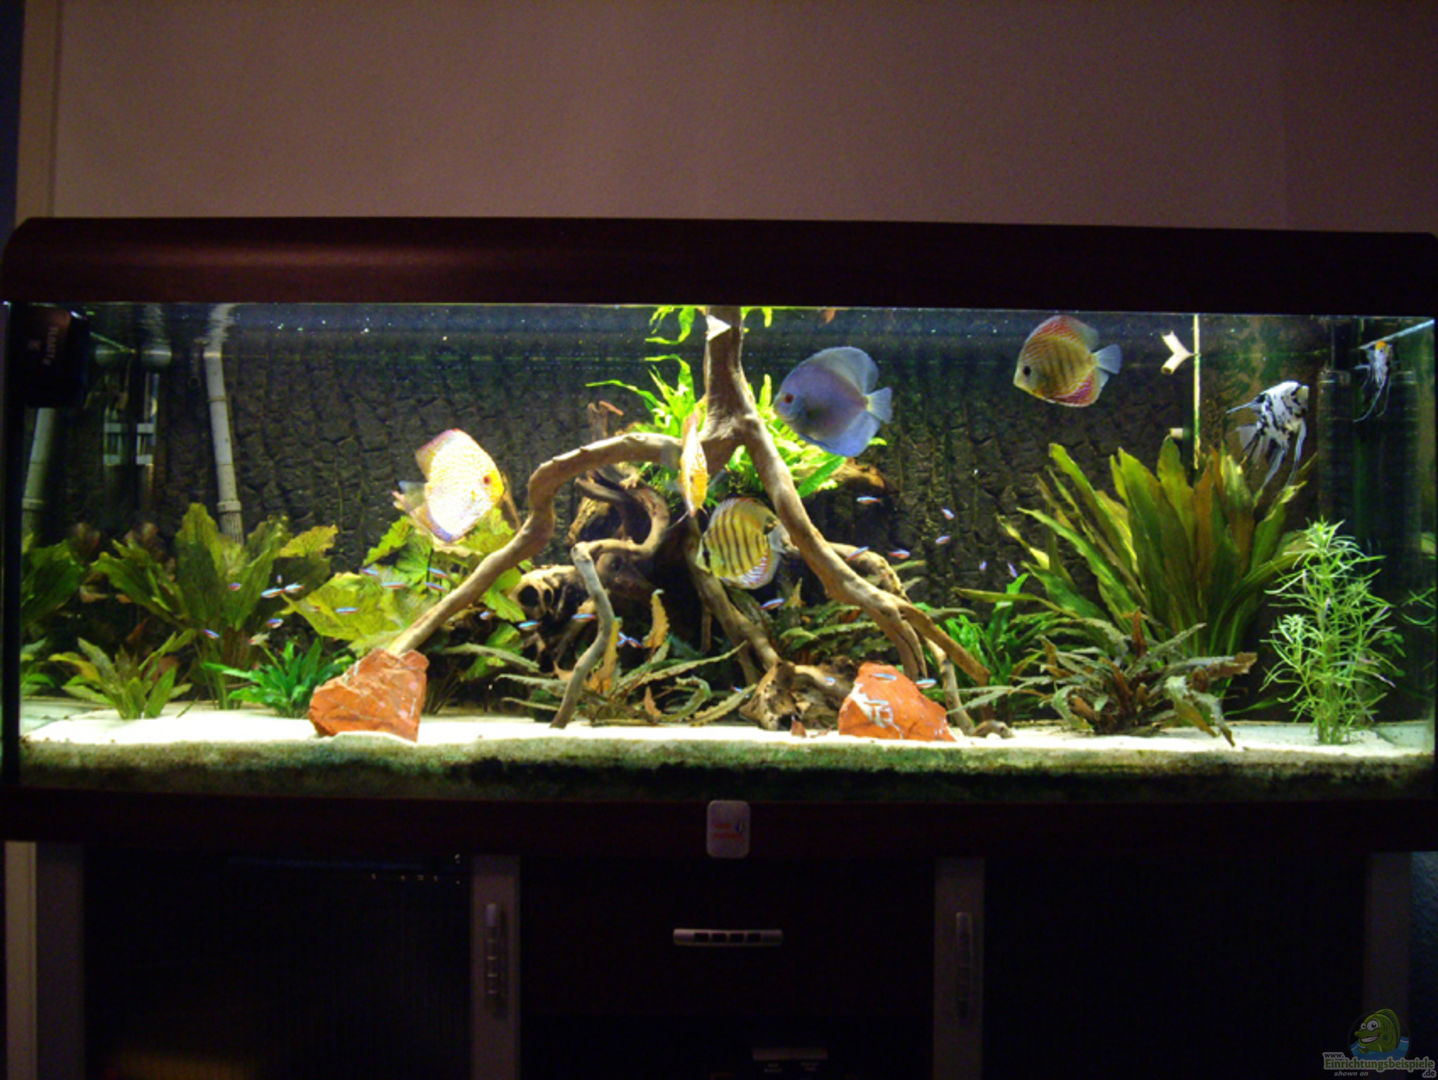 aquarium von franky lunatic becken 12579. Black Bedroom Furniture Sets. Home Design Ideas